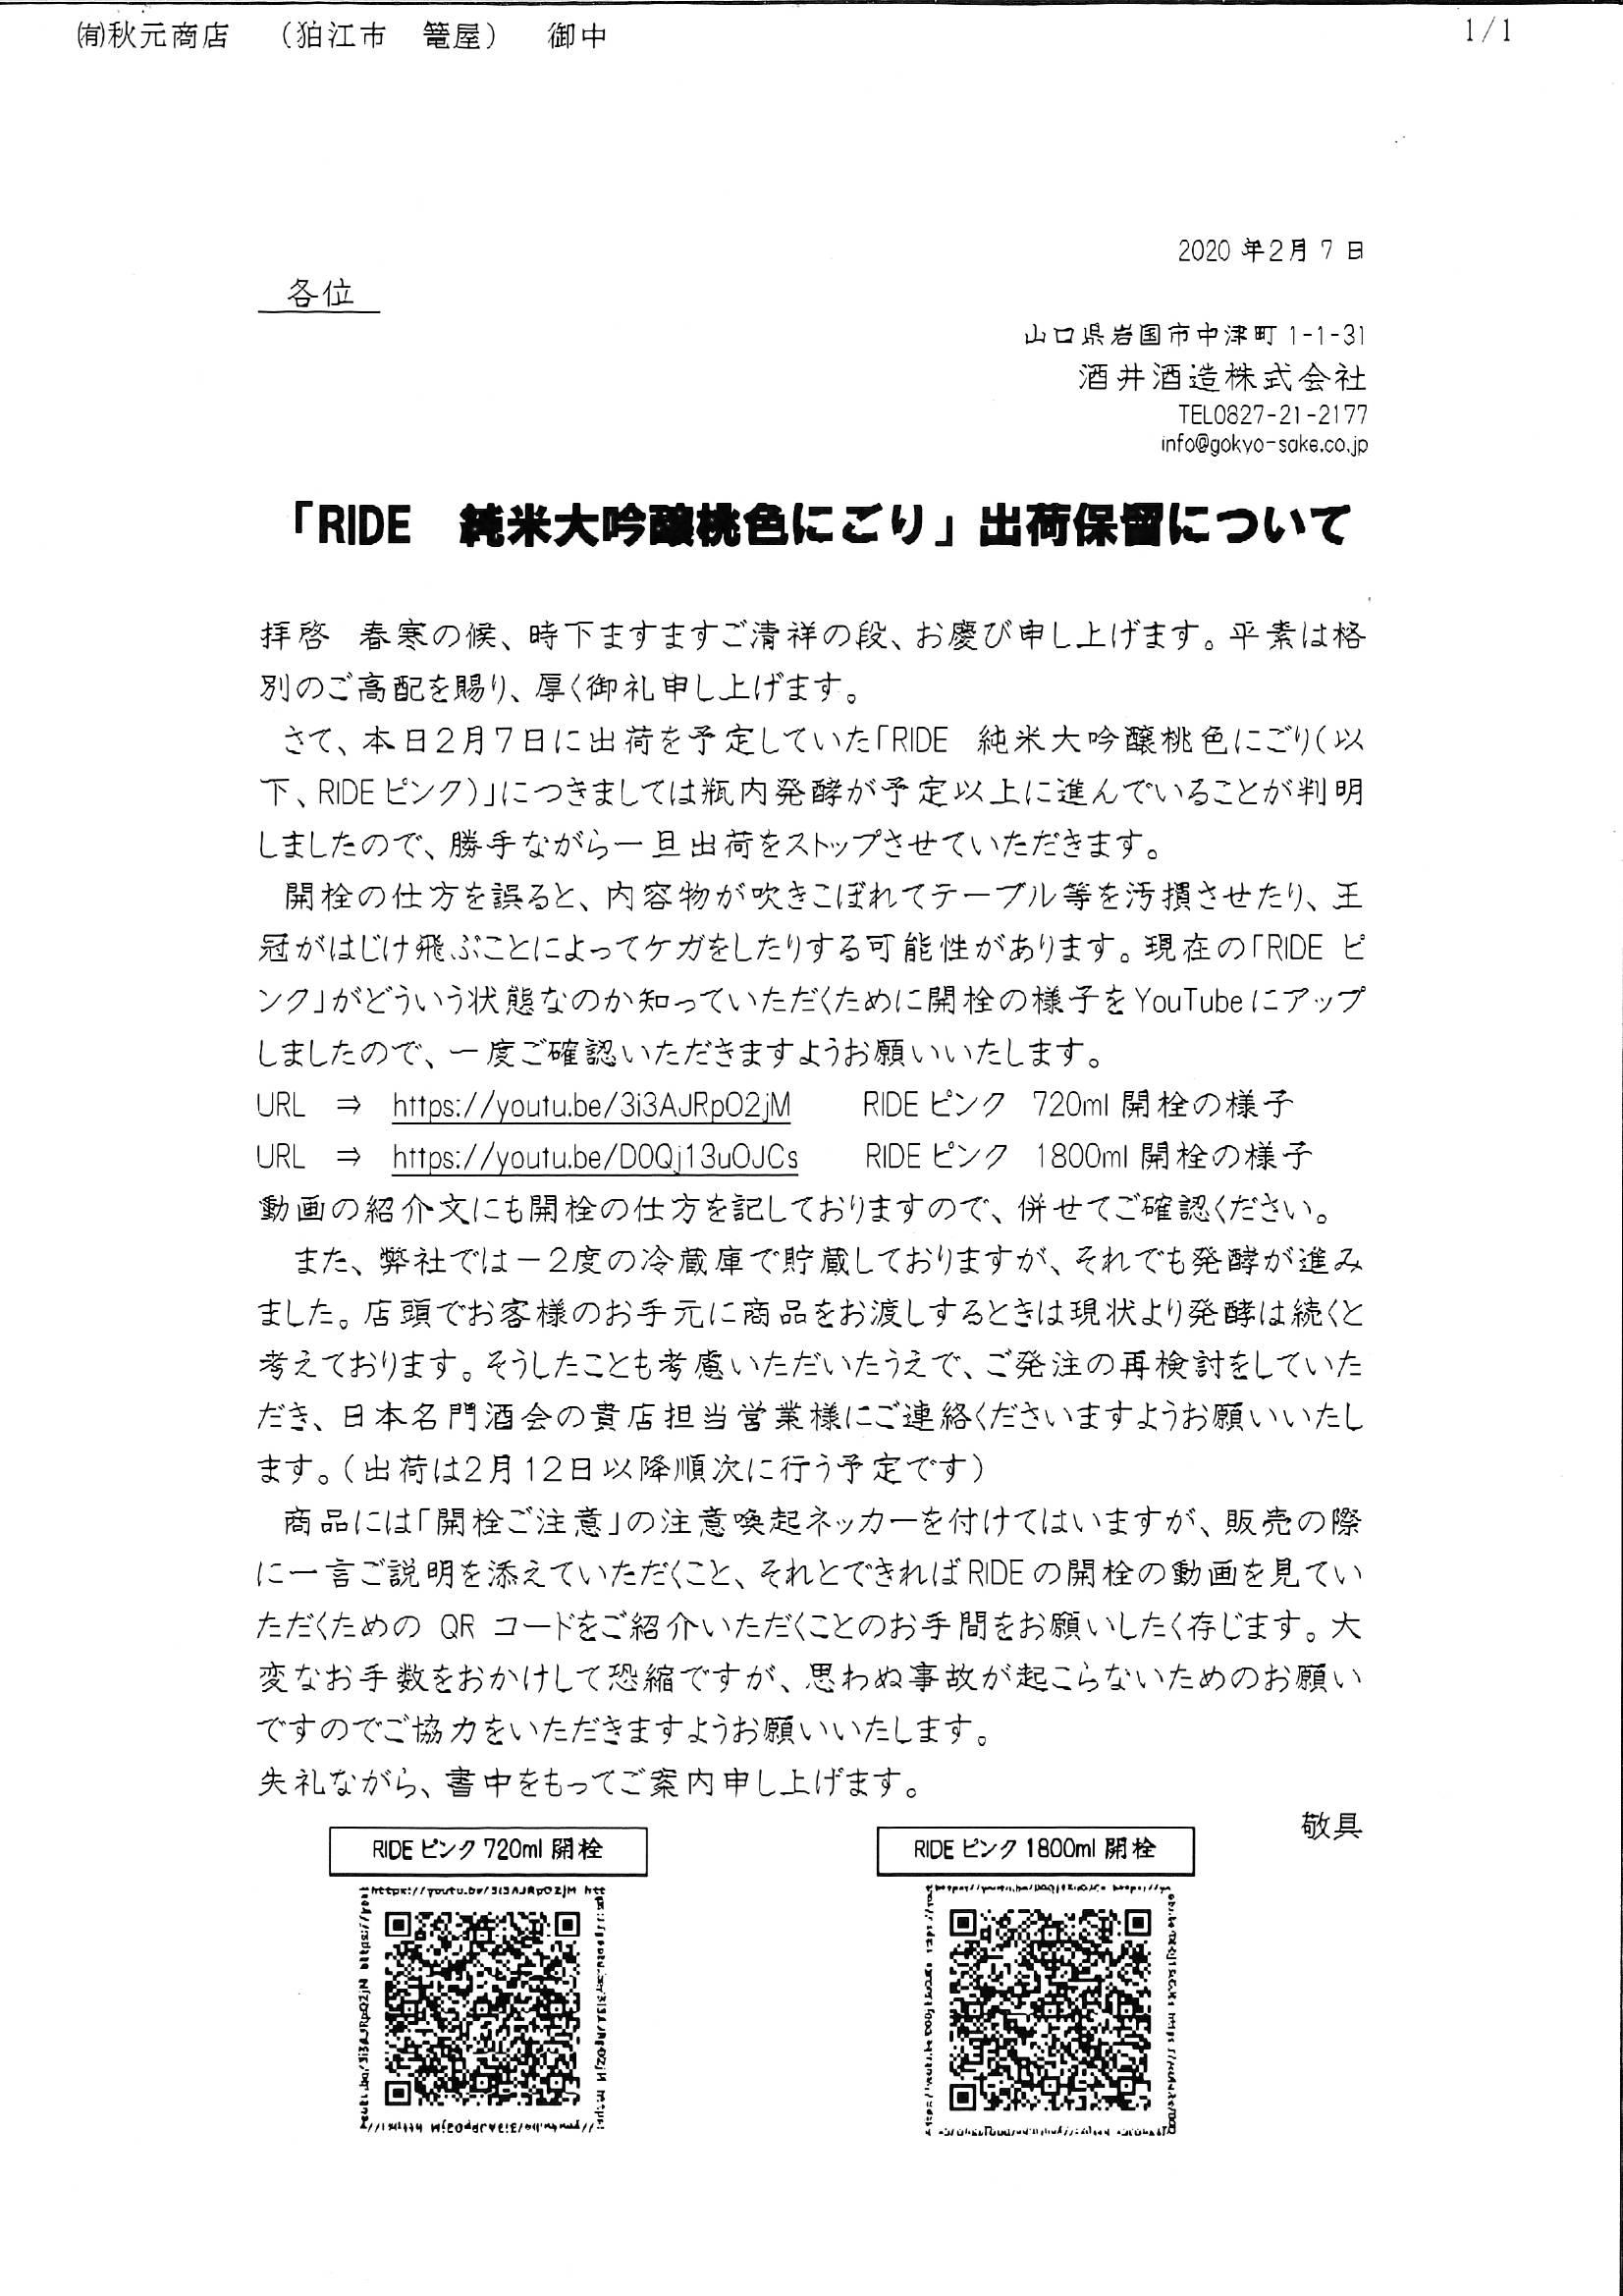 MX-2640_20200220_161218_001.jpg